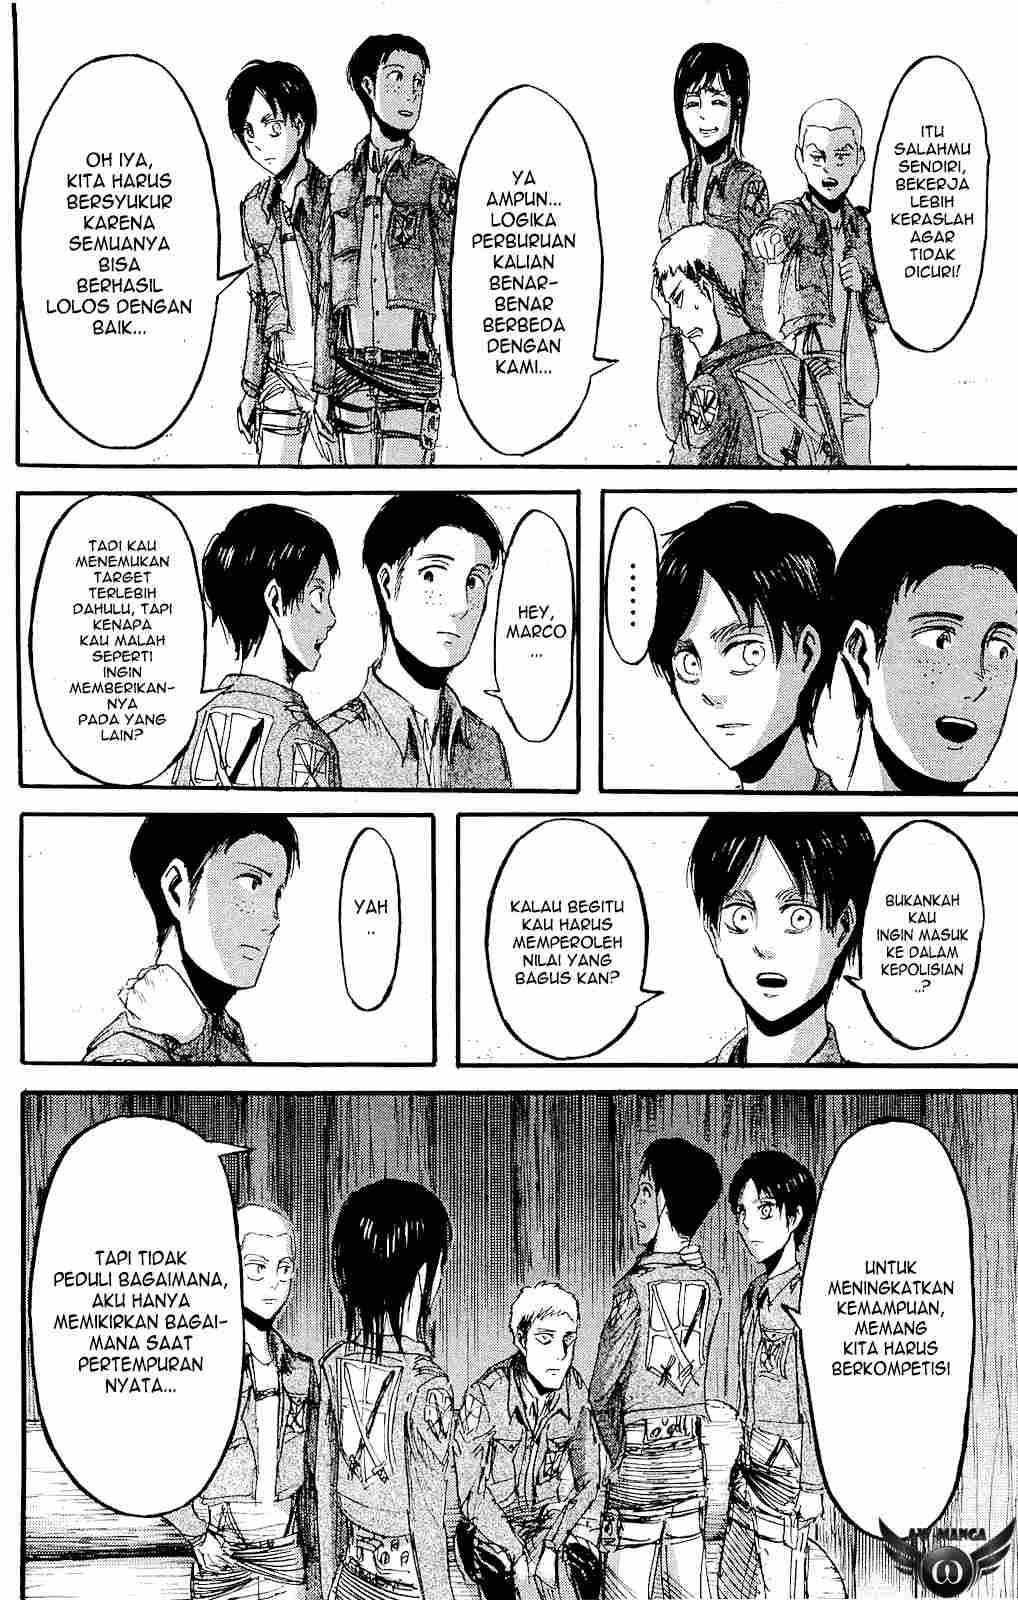 Komik shingeki no kyojin 018 - sekarang apa yang harus dilakukan 19 Indonesia shingeki no kyojin 018 - sekarang apa yang harus dilakukan Terbaru 13|Baca Manga Komik Indonesia|